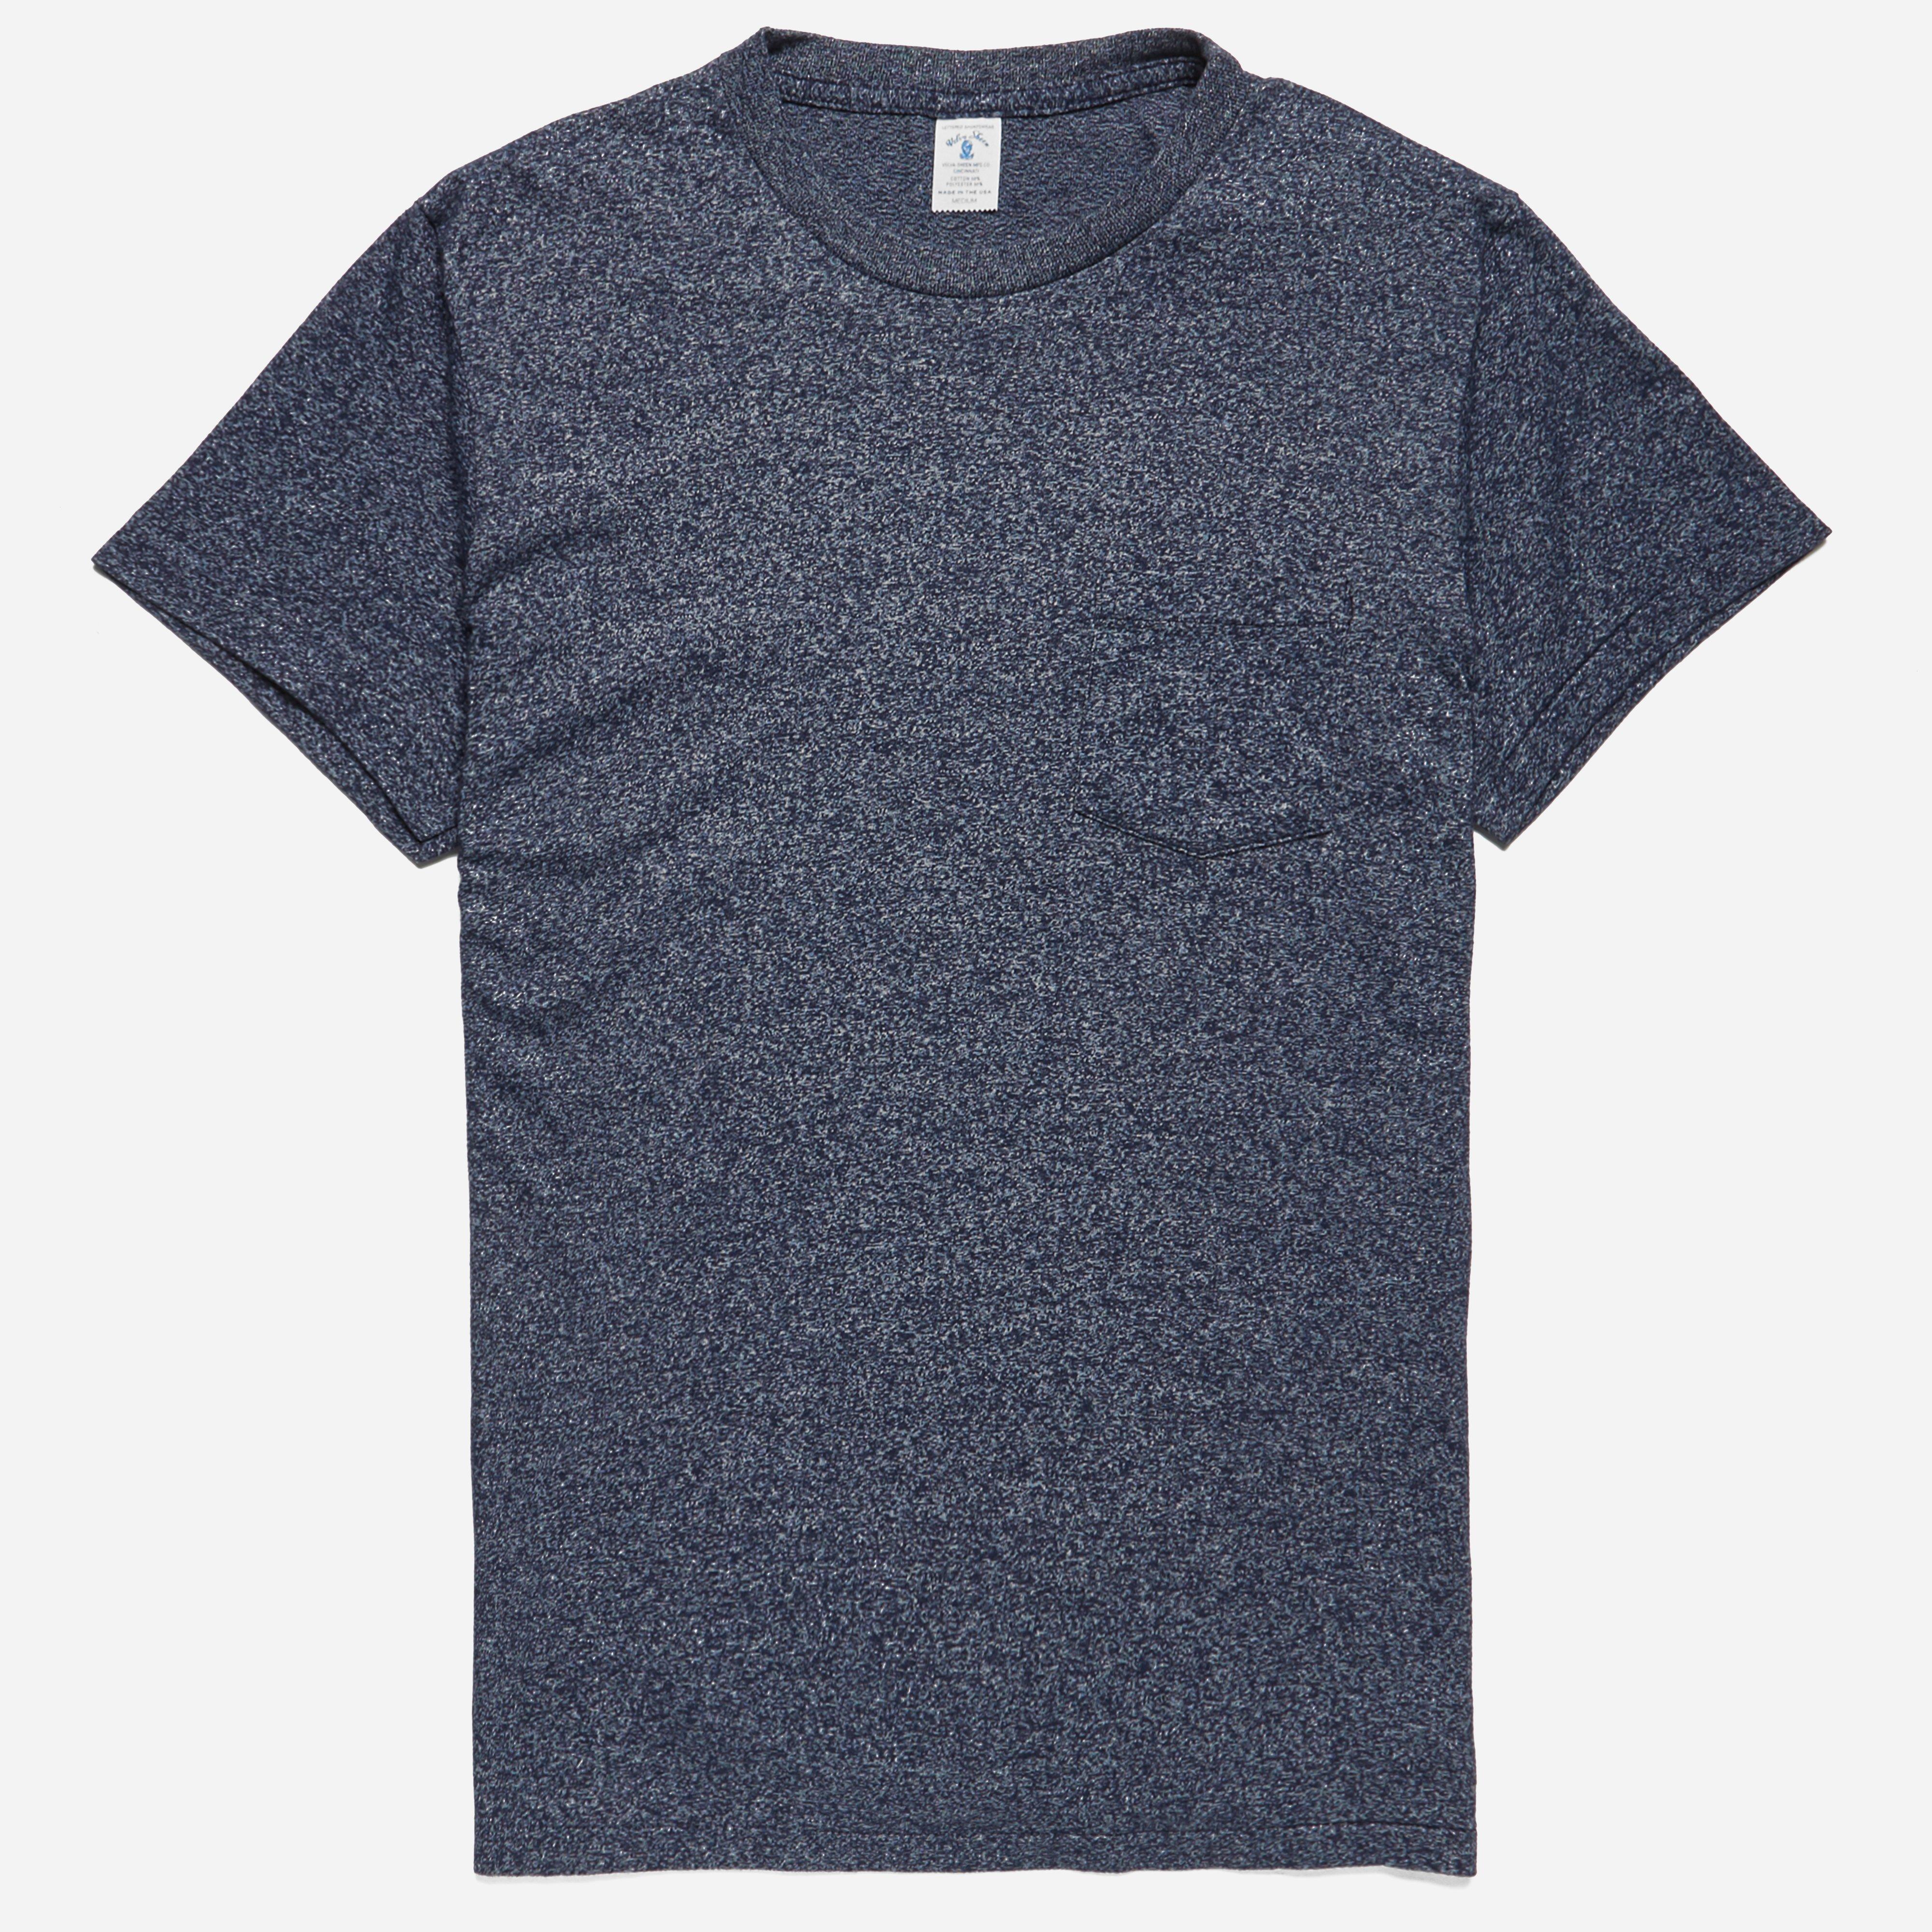 Velva Sheen Crew Neck Pocket T-shirt Heather Navy